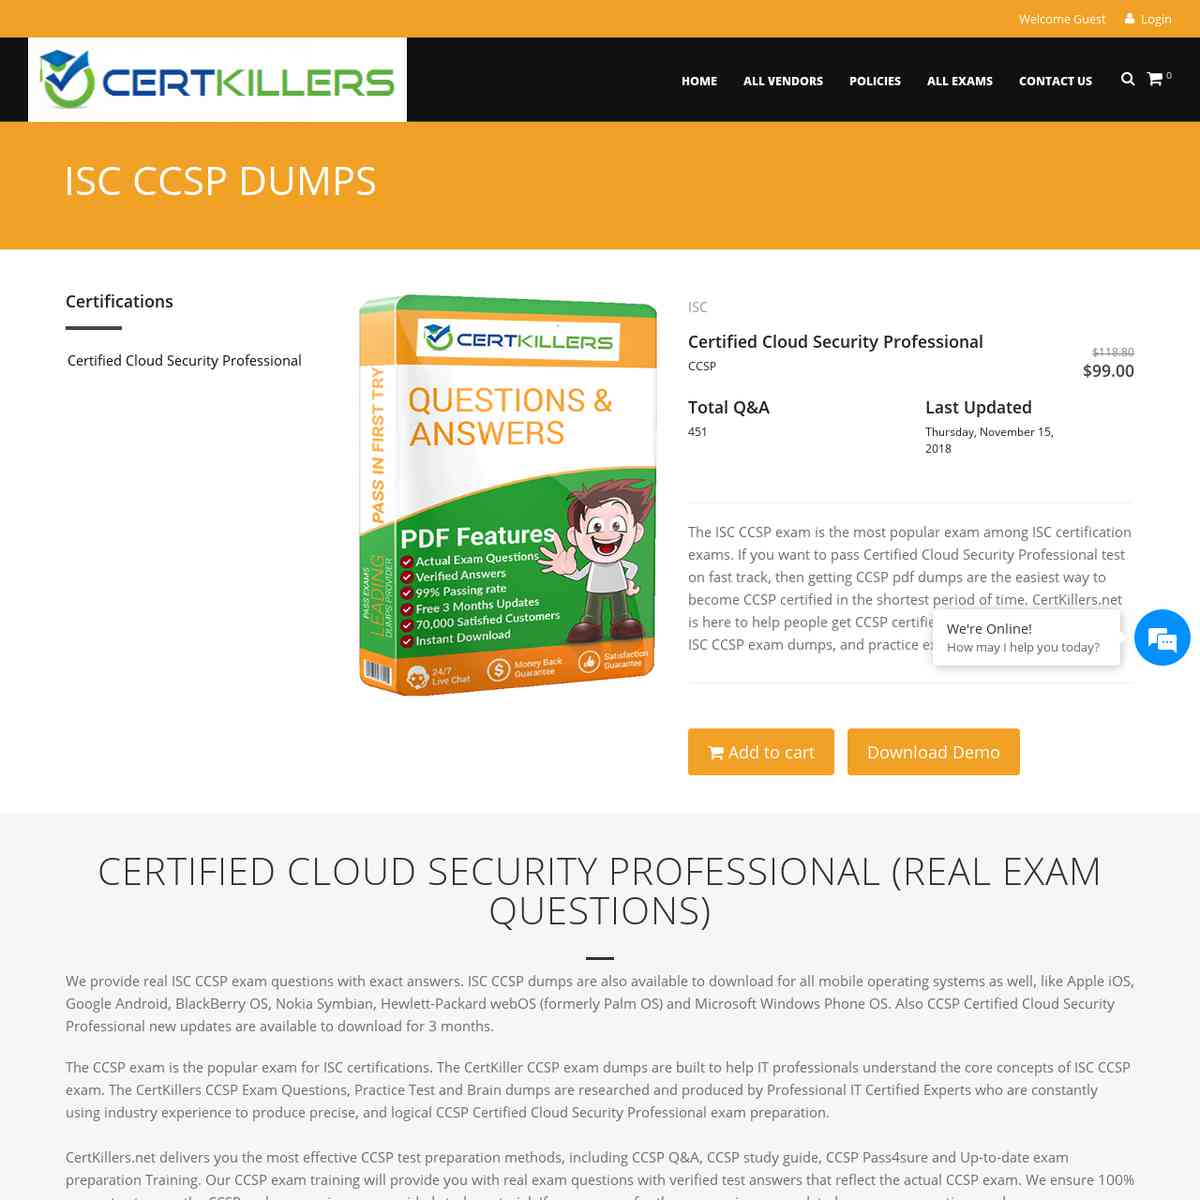 Smartest CCSP planning technique at CertKillers.net | free test online | essay questions